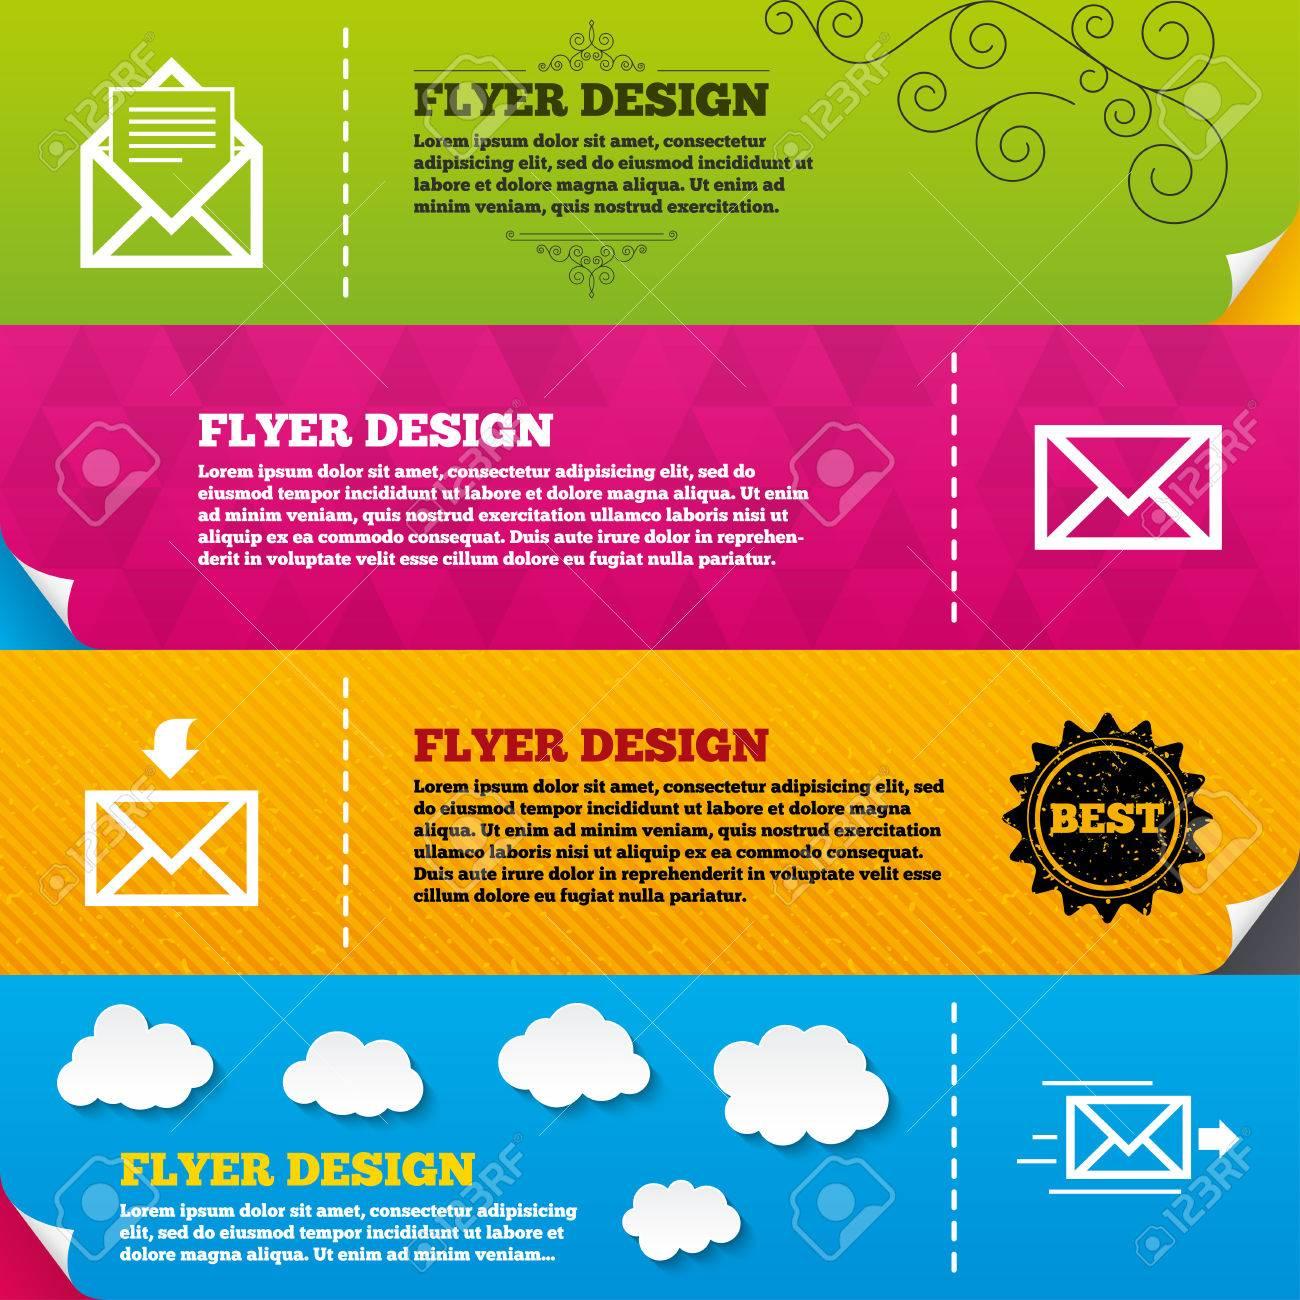 best office program for designing flyers oker whyanything co